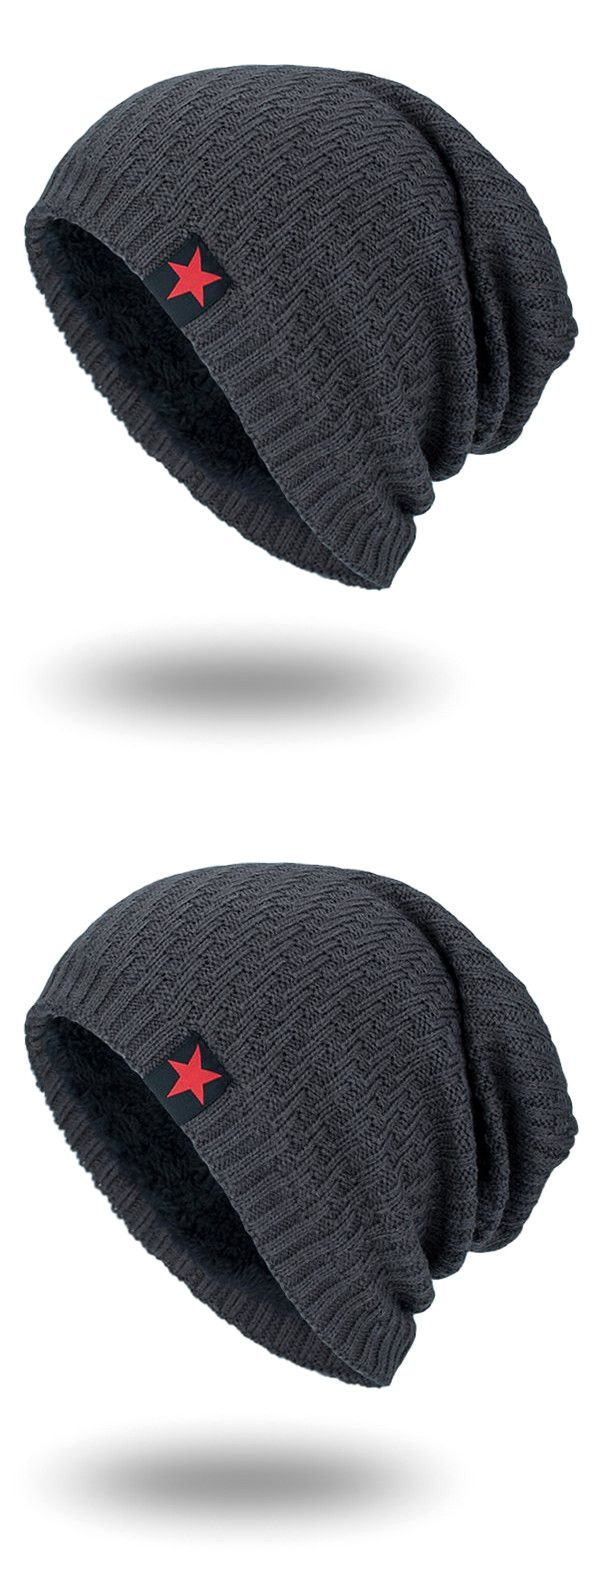 Star Label Embellished Stripy Thicken Knit Hat